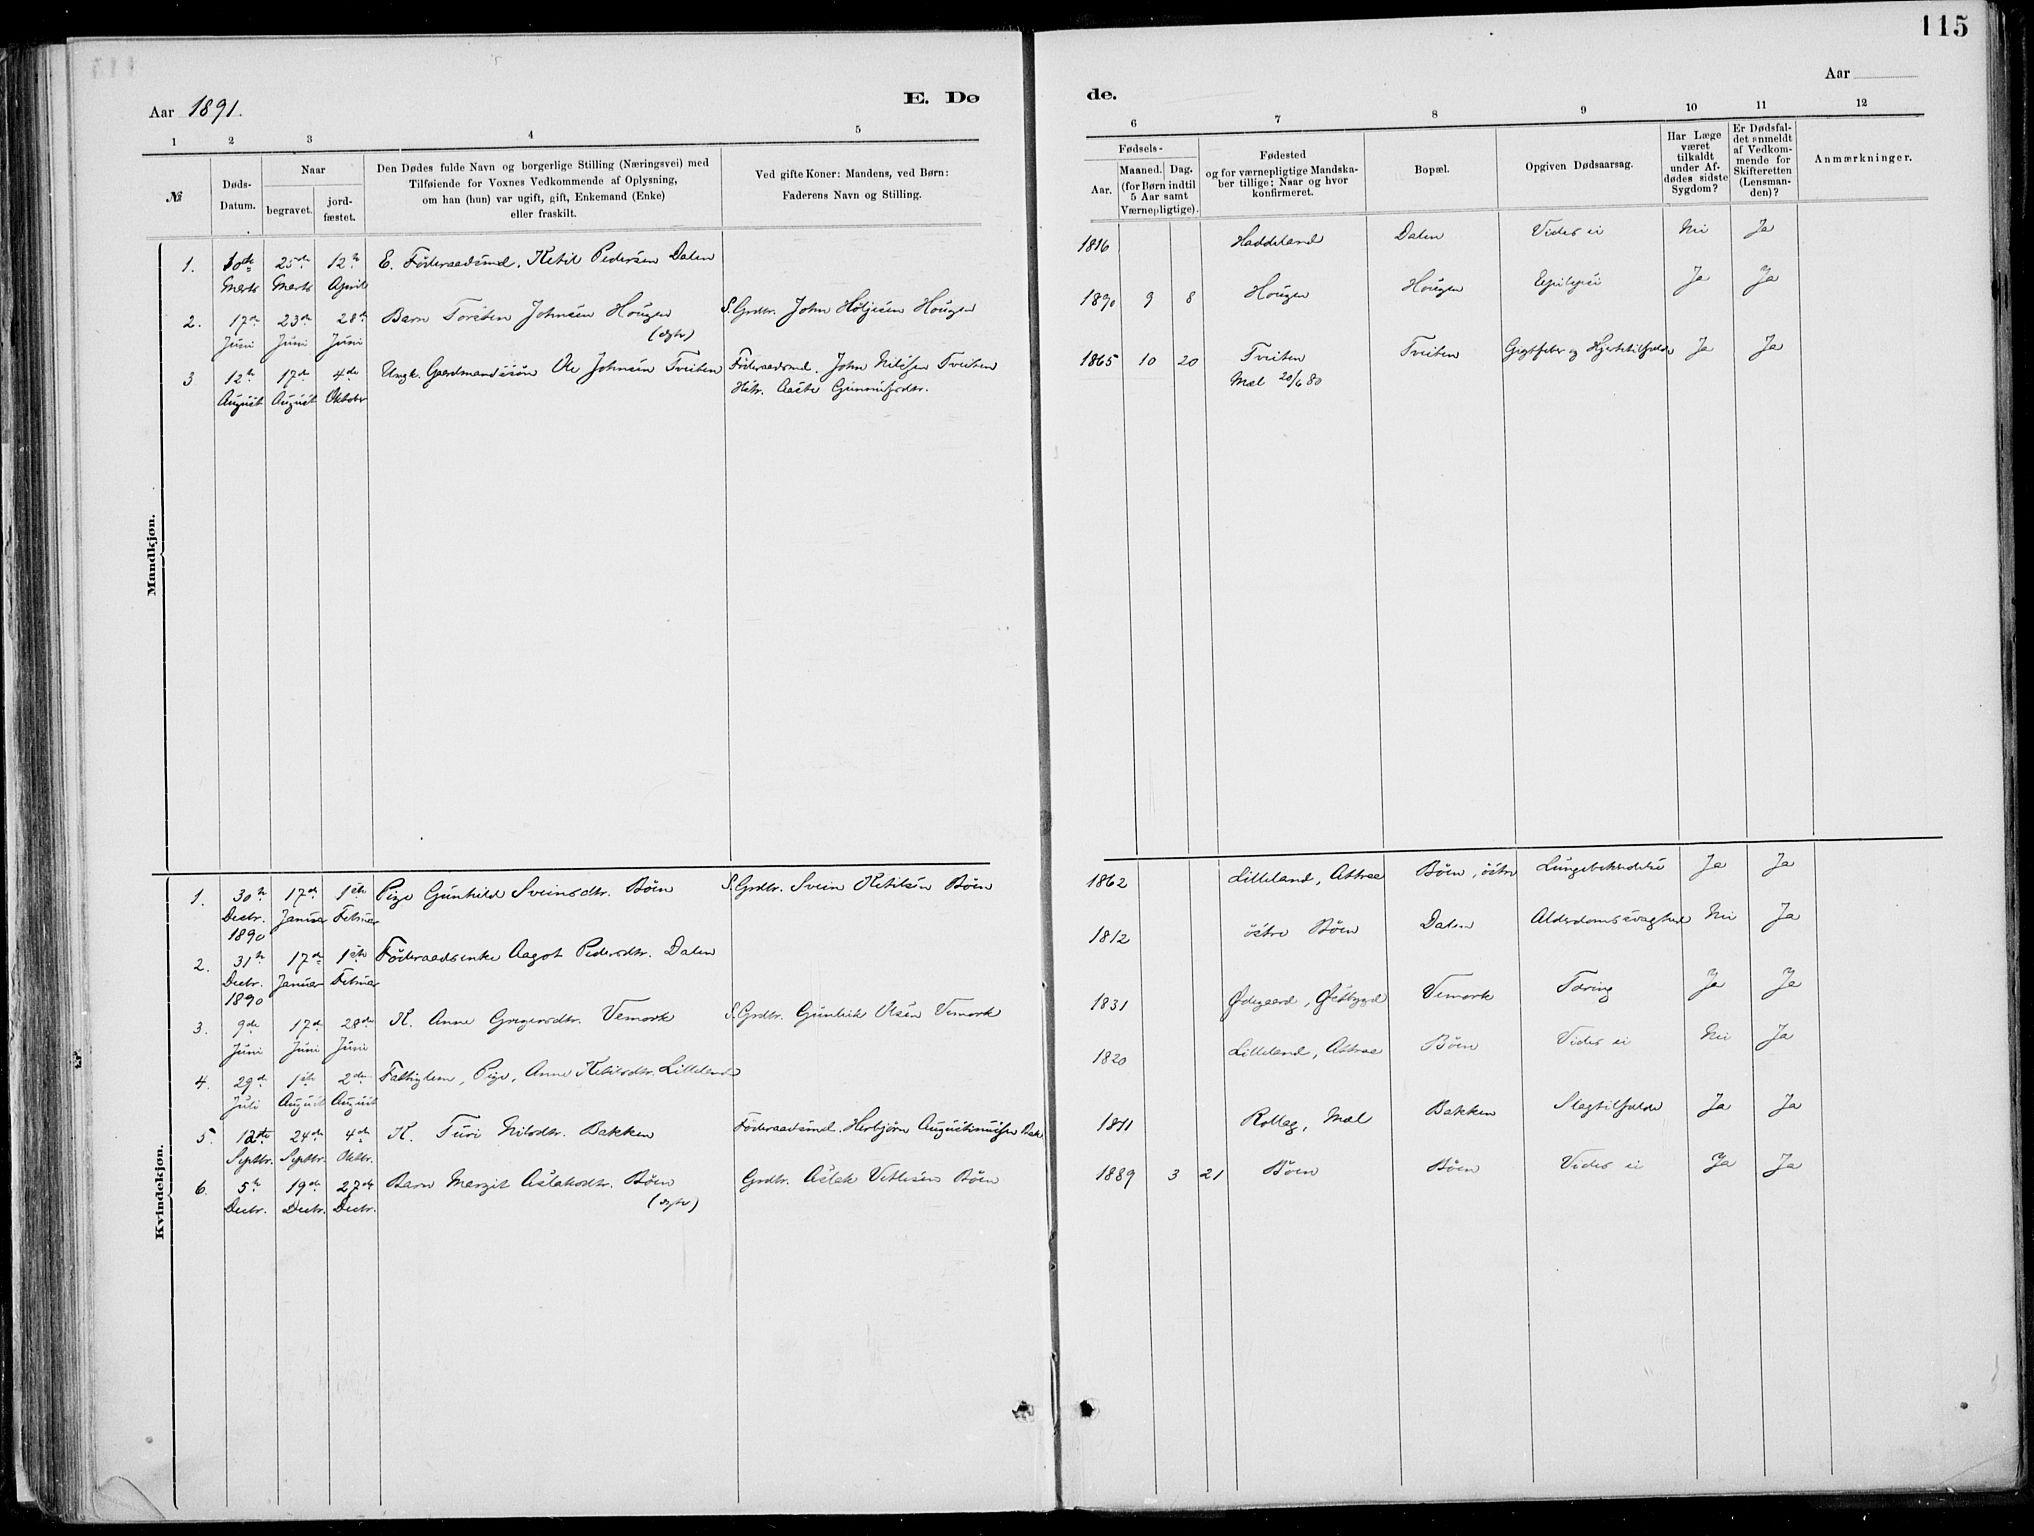 SAKO, Rjukan kirkebøker, F/Fa/L0001: Ministerialbok nr. 1, 1878-1912, s. 115